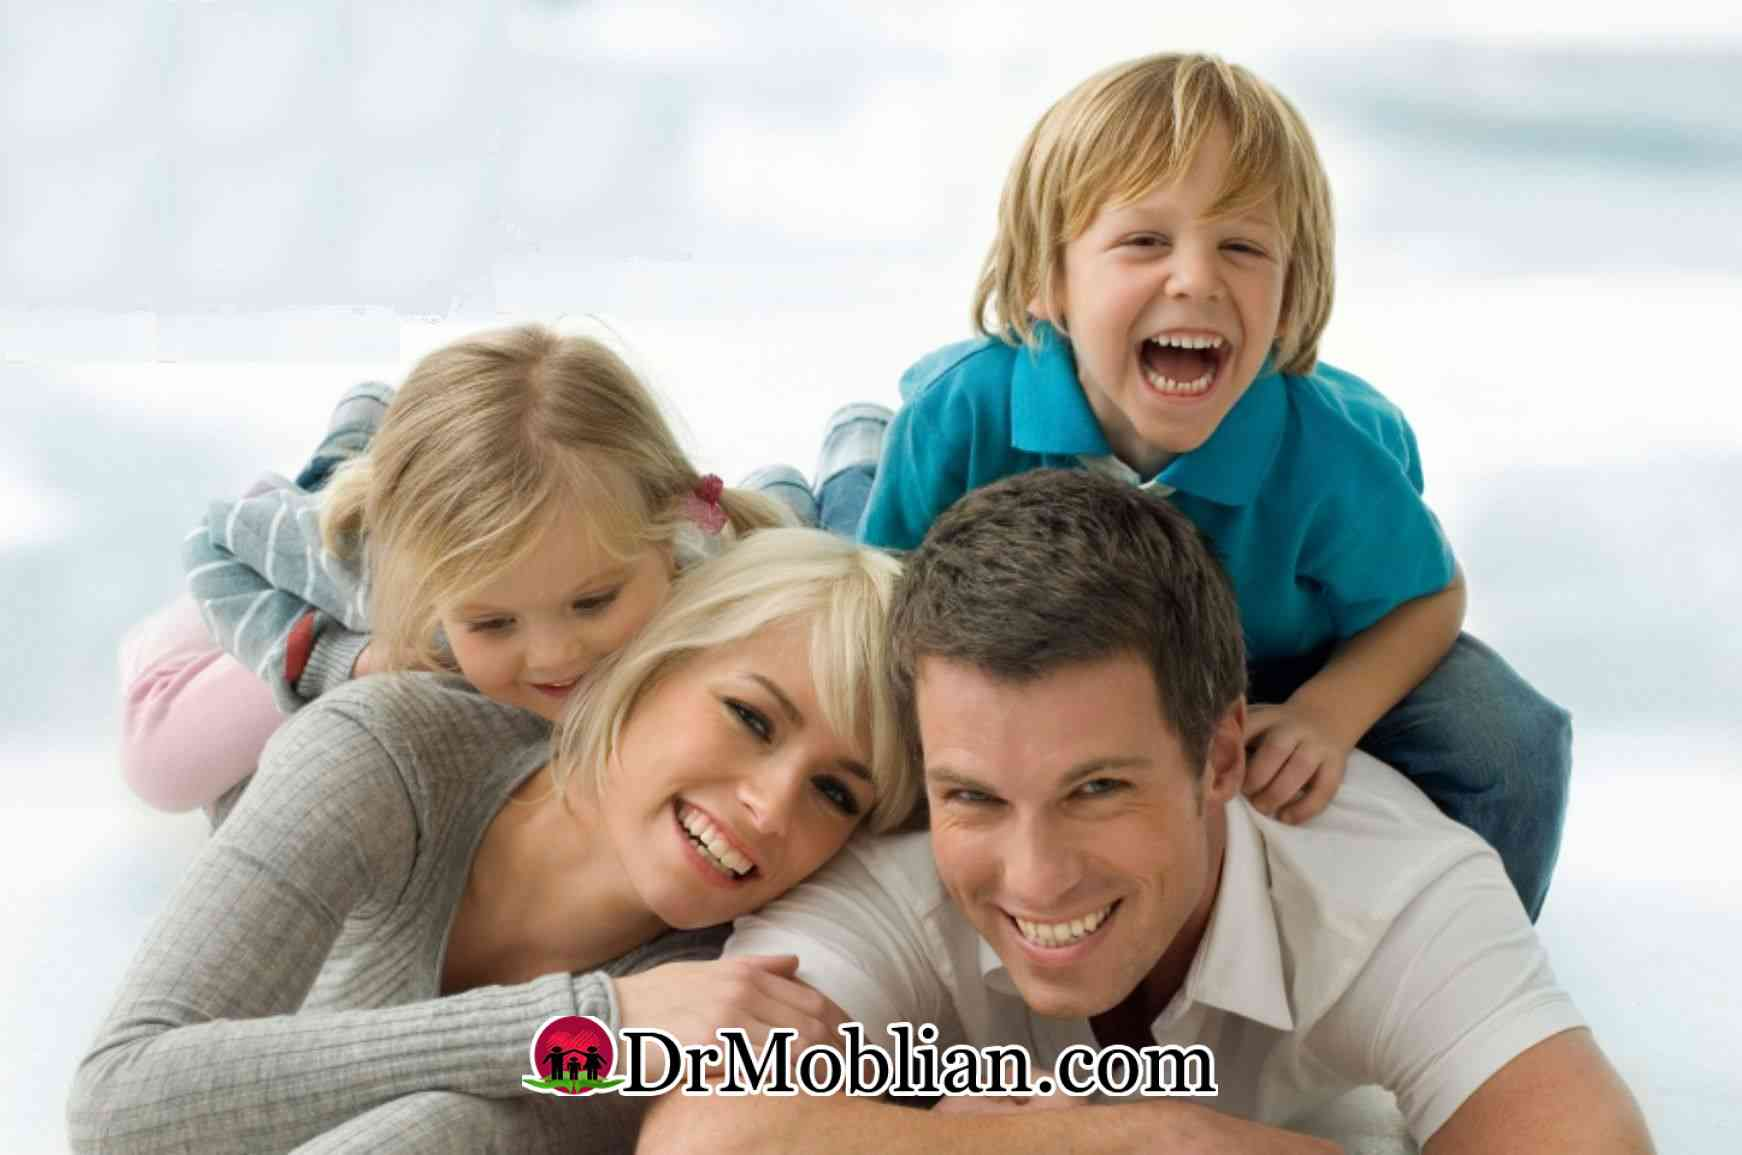 والدین شاد،کودکان شاد